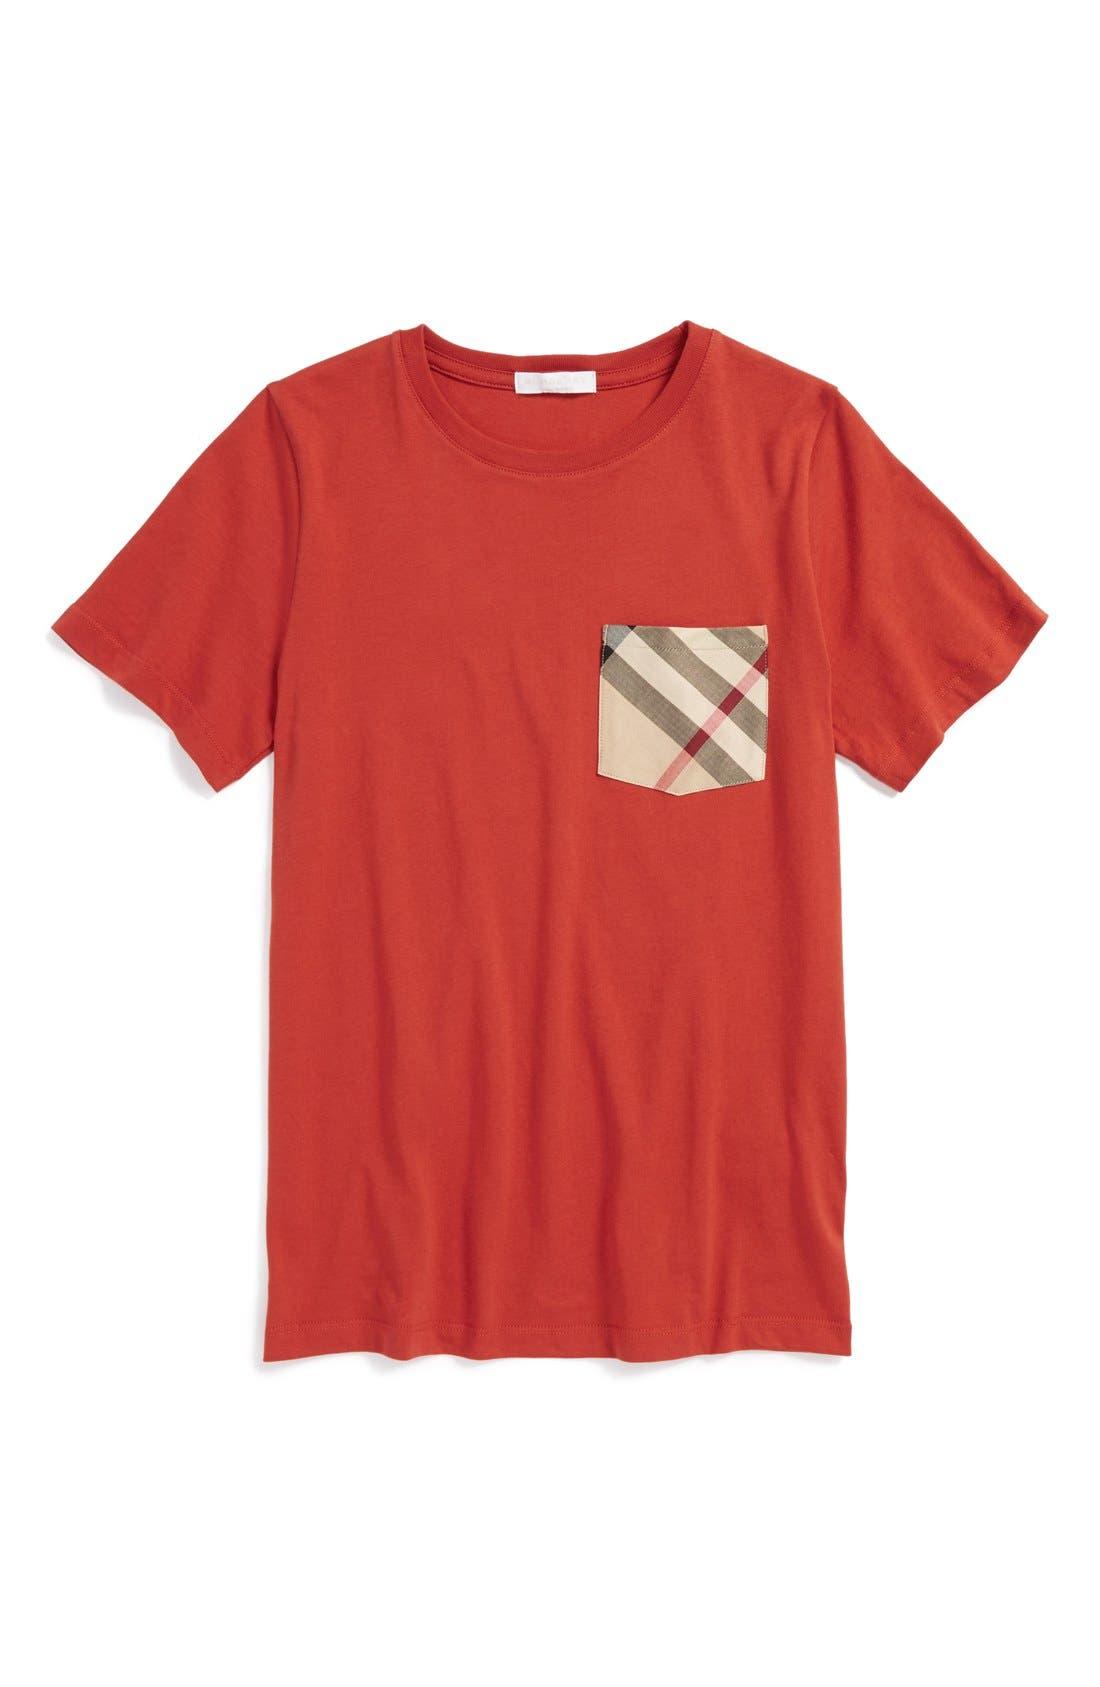 Main Image - Burberry Check Print Chest Pocket T-Shirt (Little Boys & Big Boys)